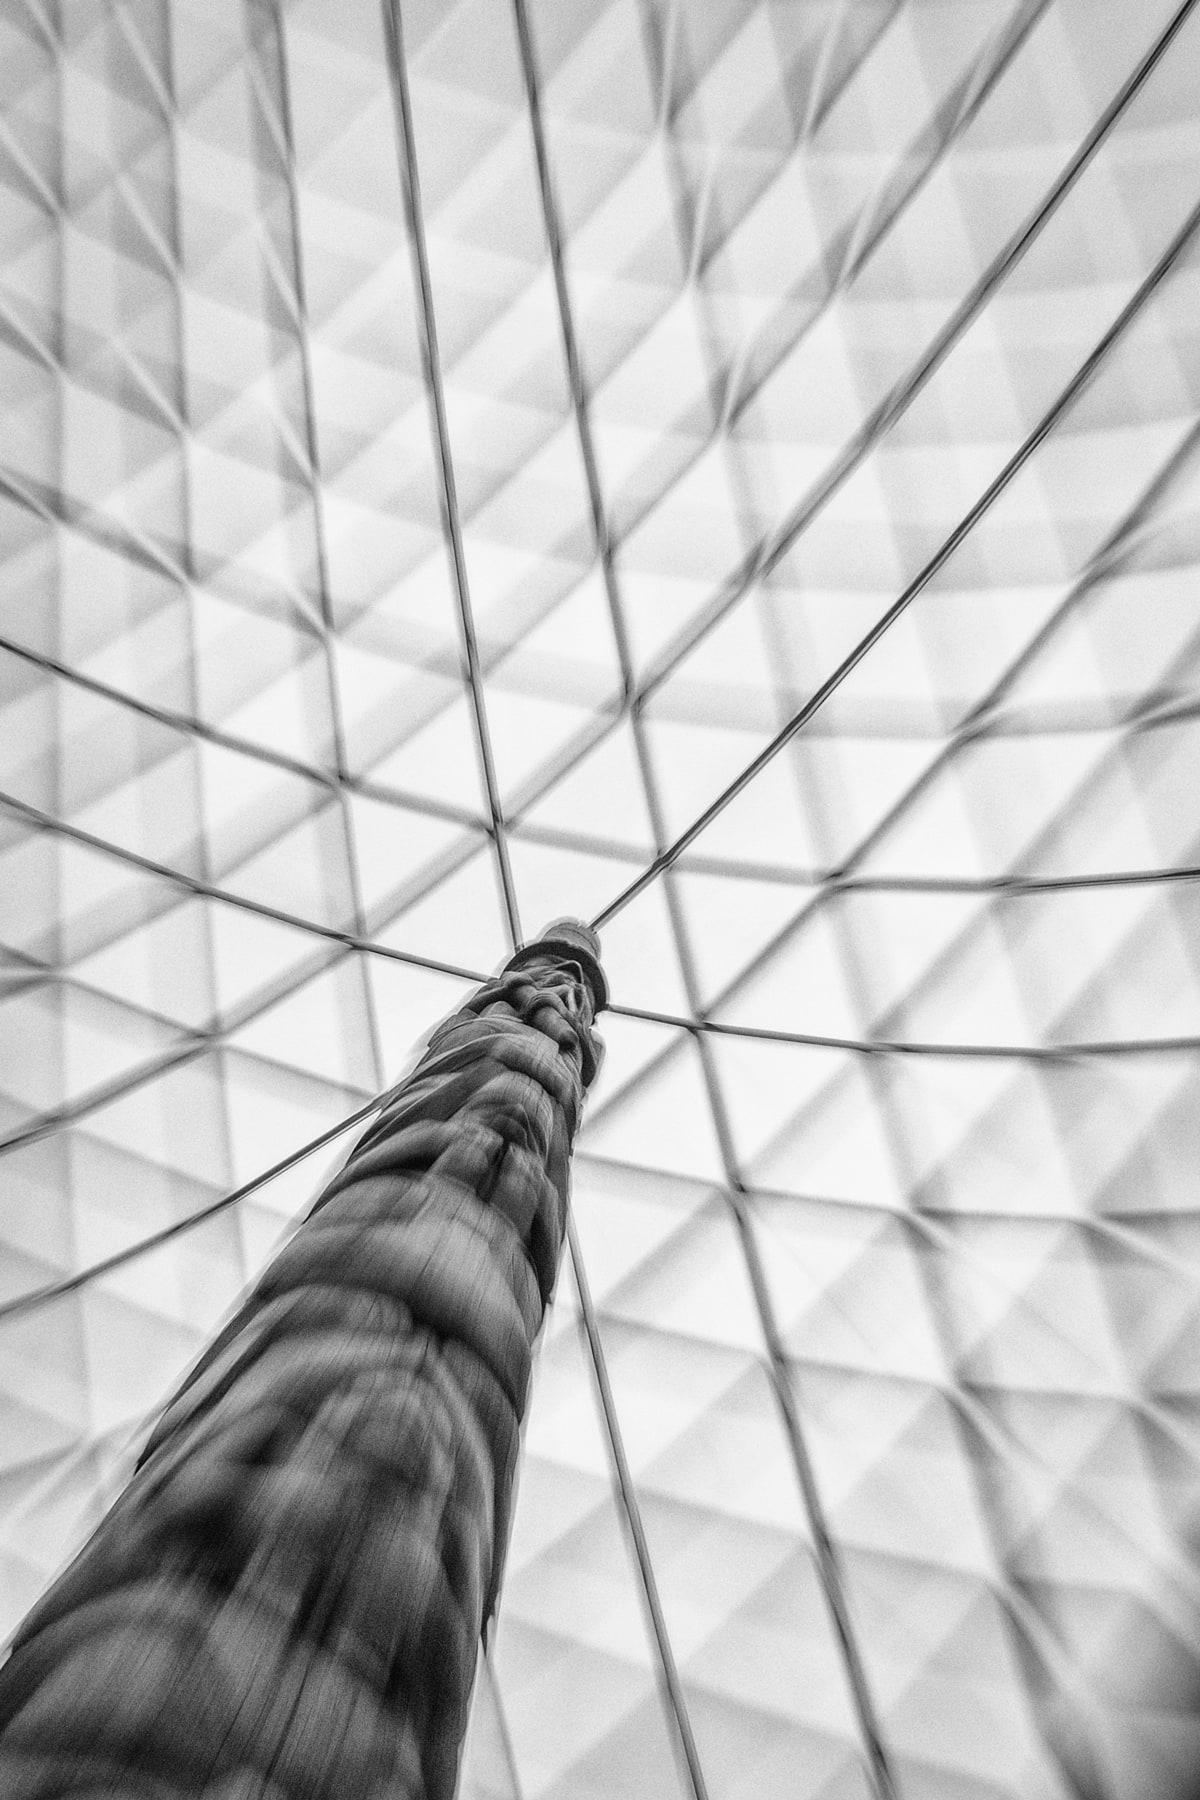 fabio_burrelli_street_photography_architecture_urban_structures_london_P5B3010.jpg